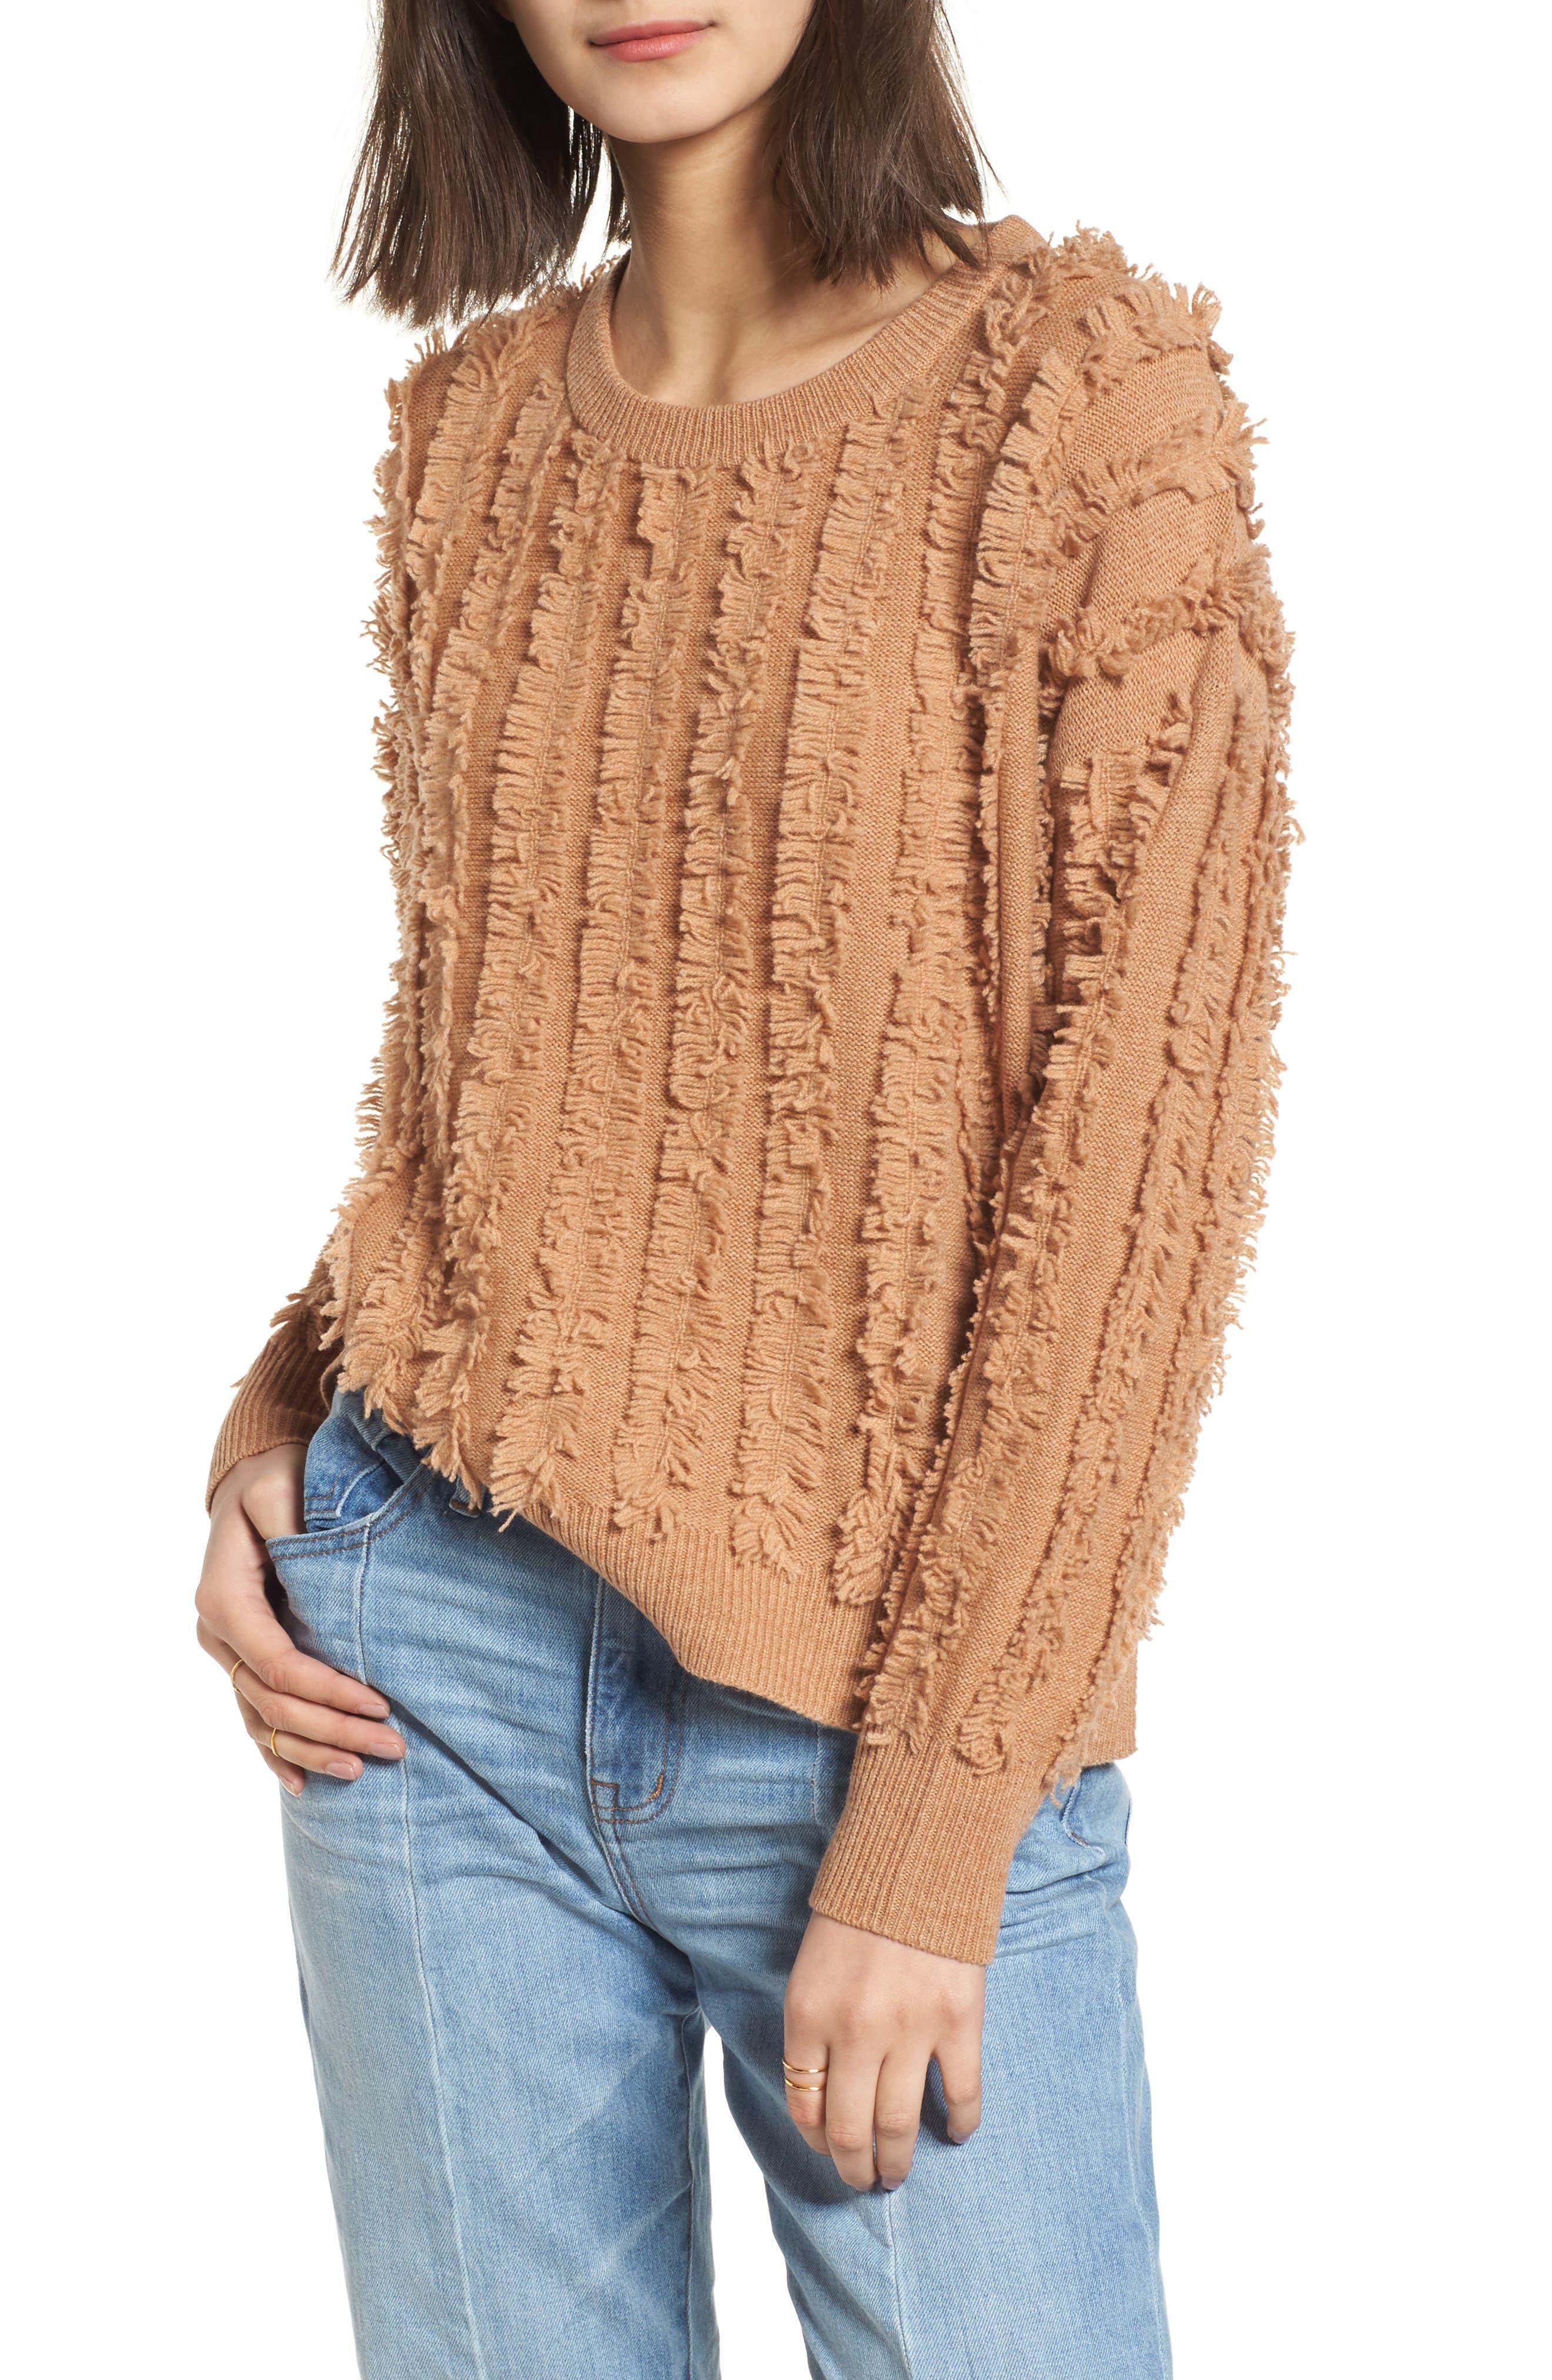 Main Image - Madewell Fringe Stripe Pullover Sweater